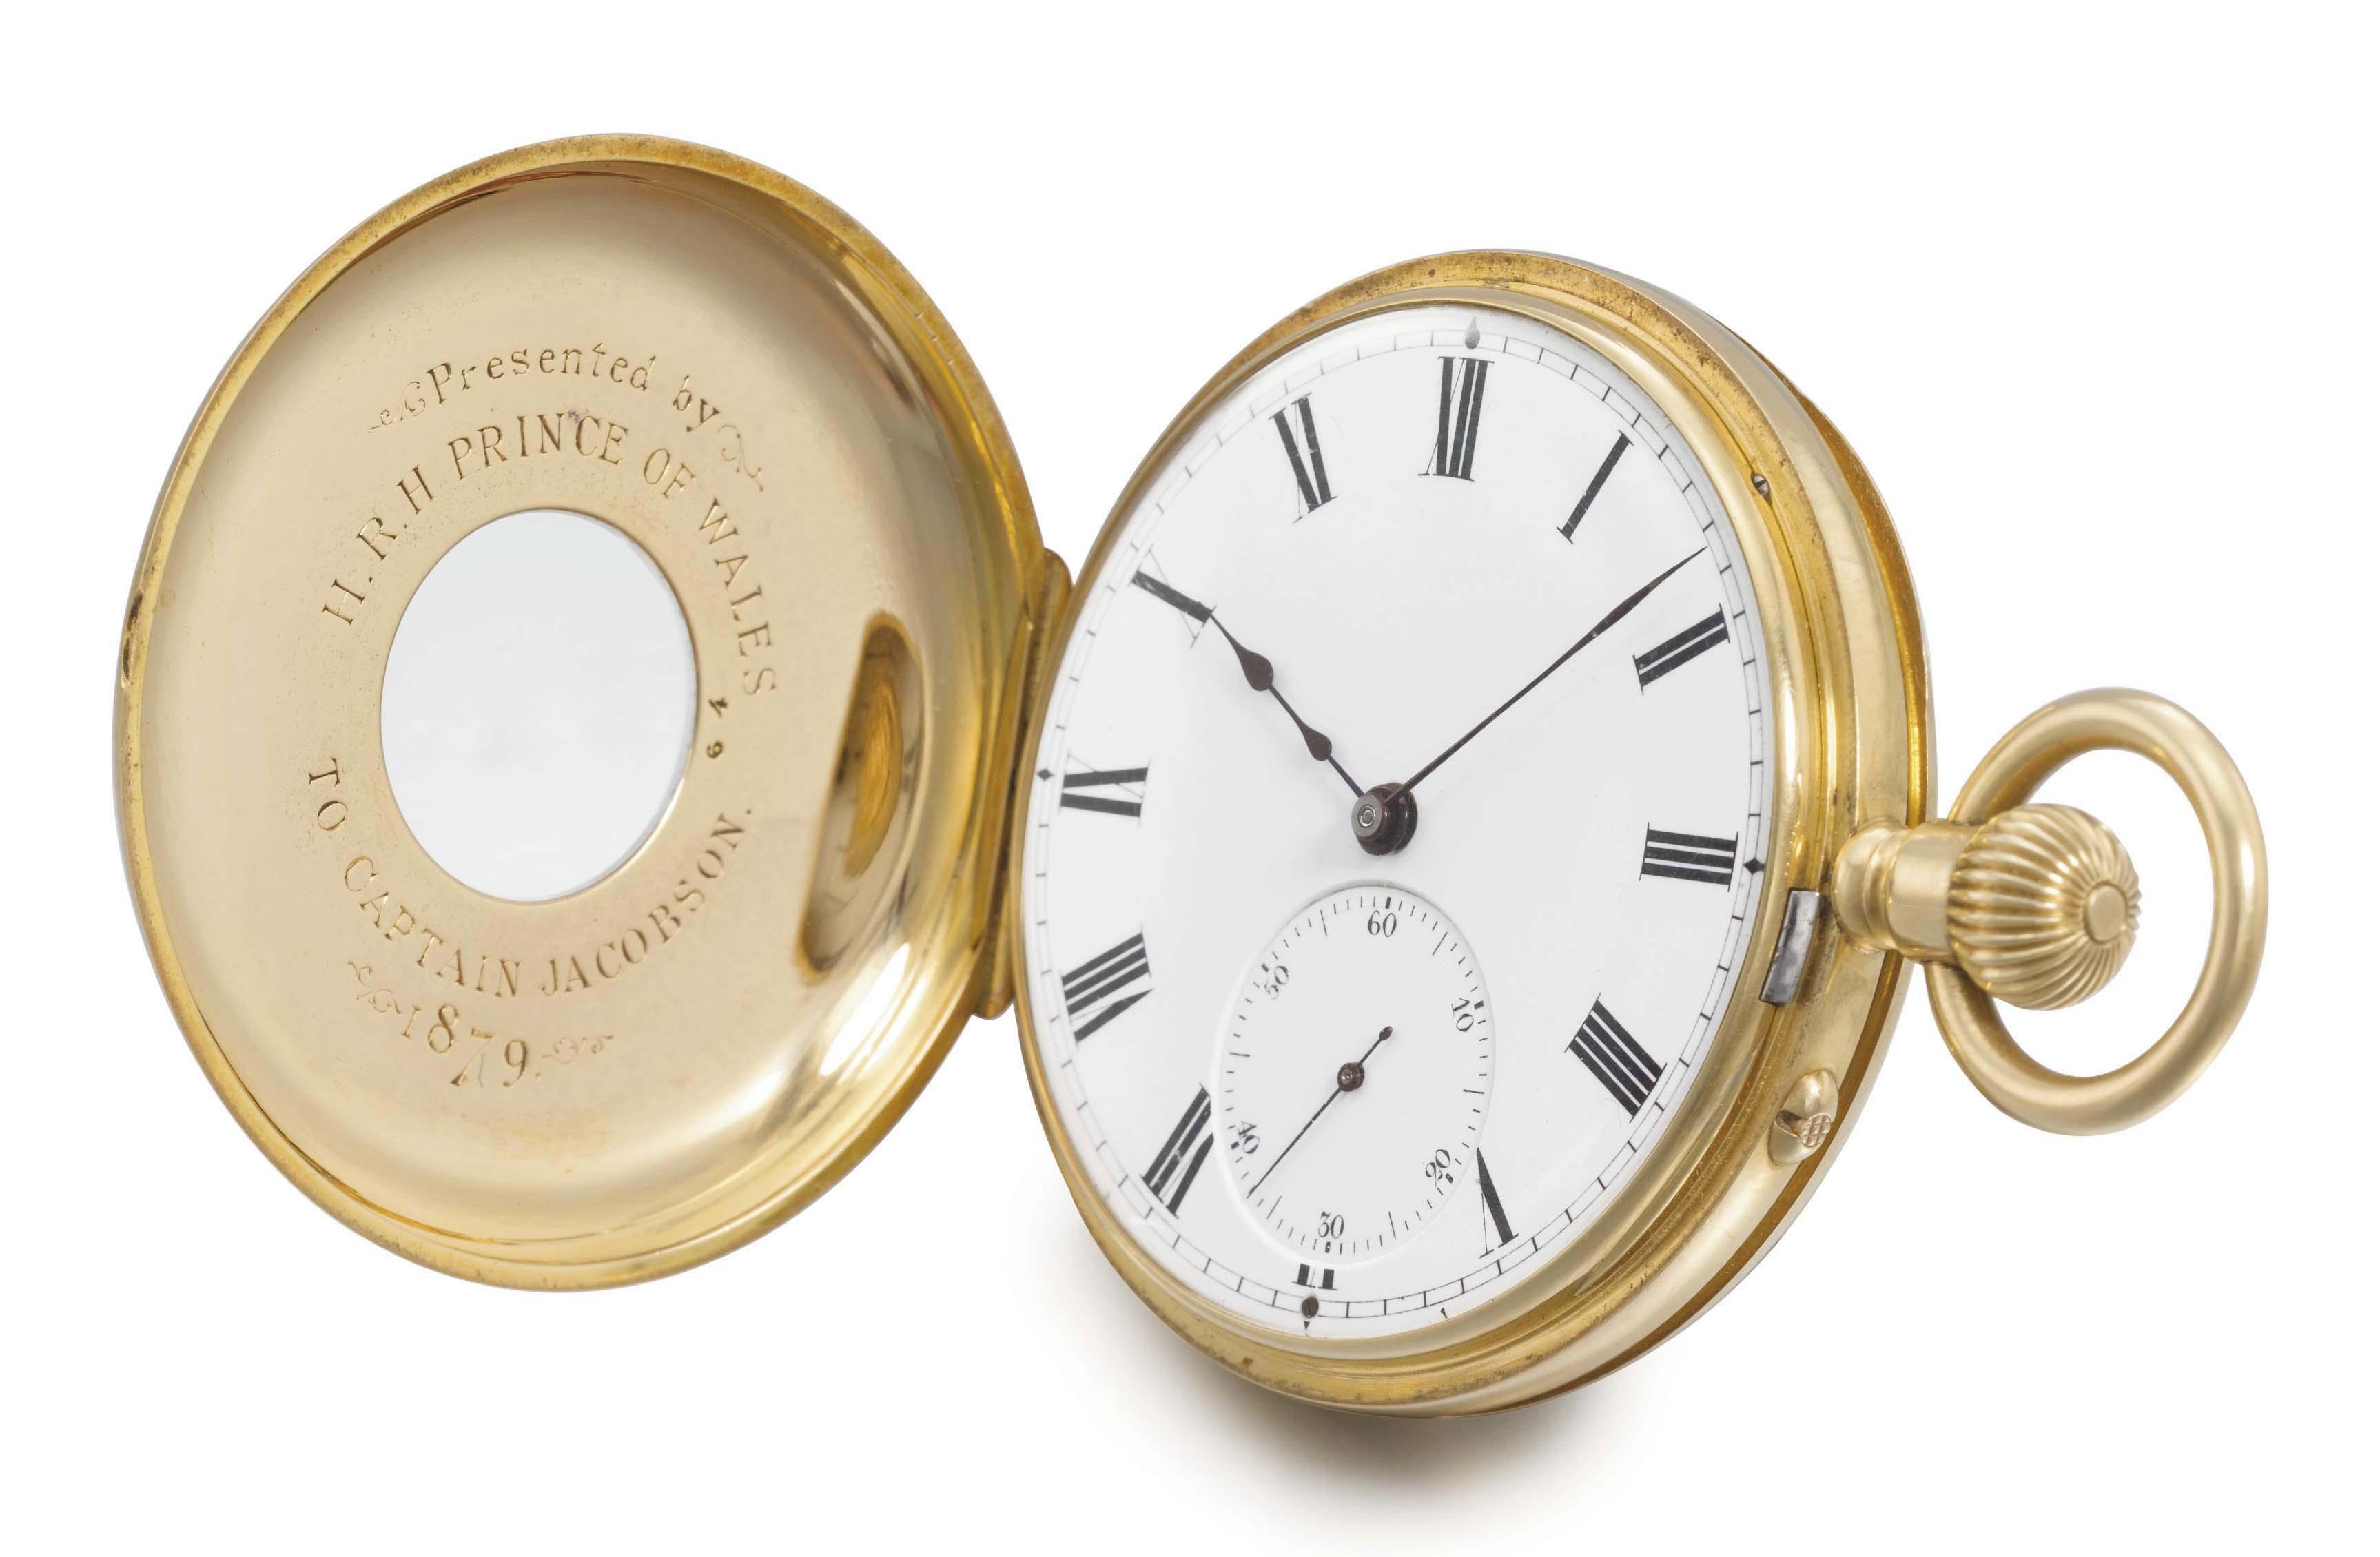 Klaftenberger. A fine 18K gold half hunter case keyless lever Royal Presentation watch with original box